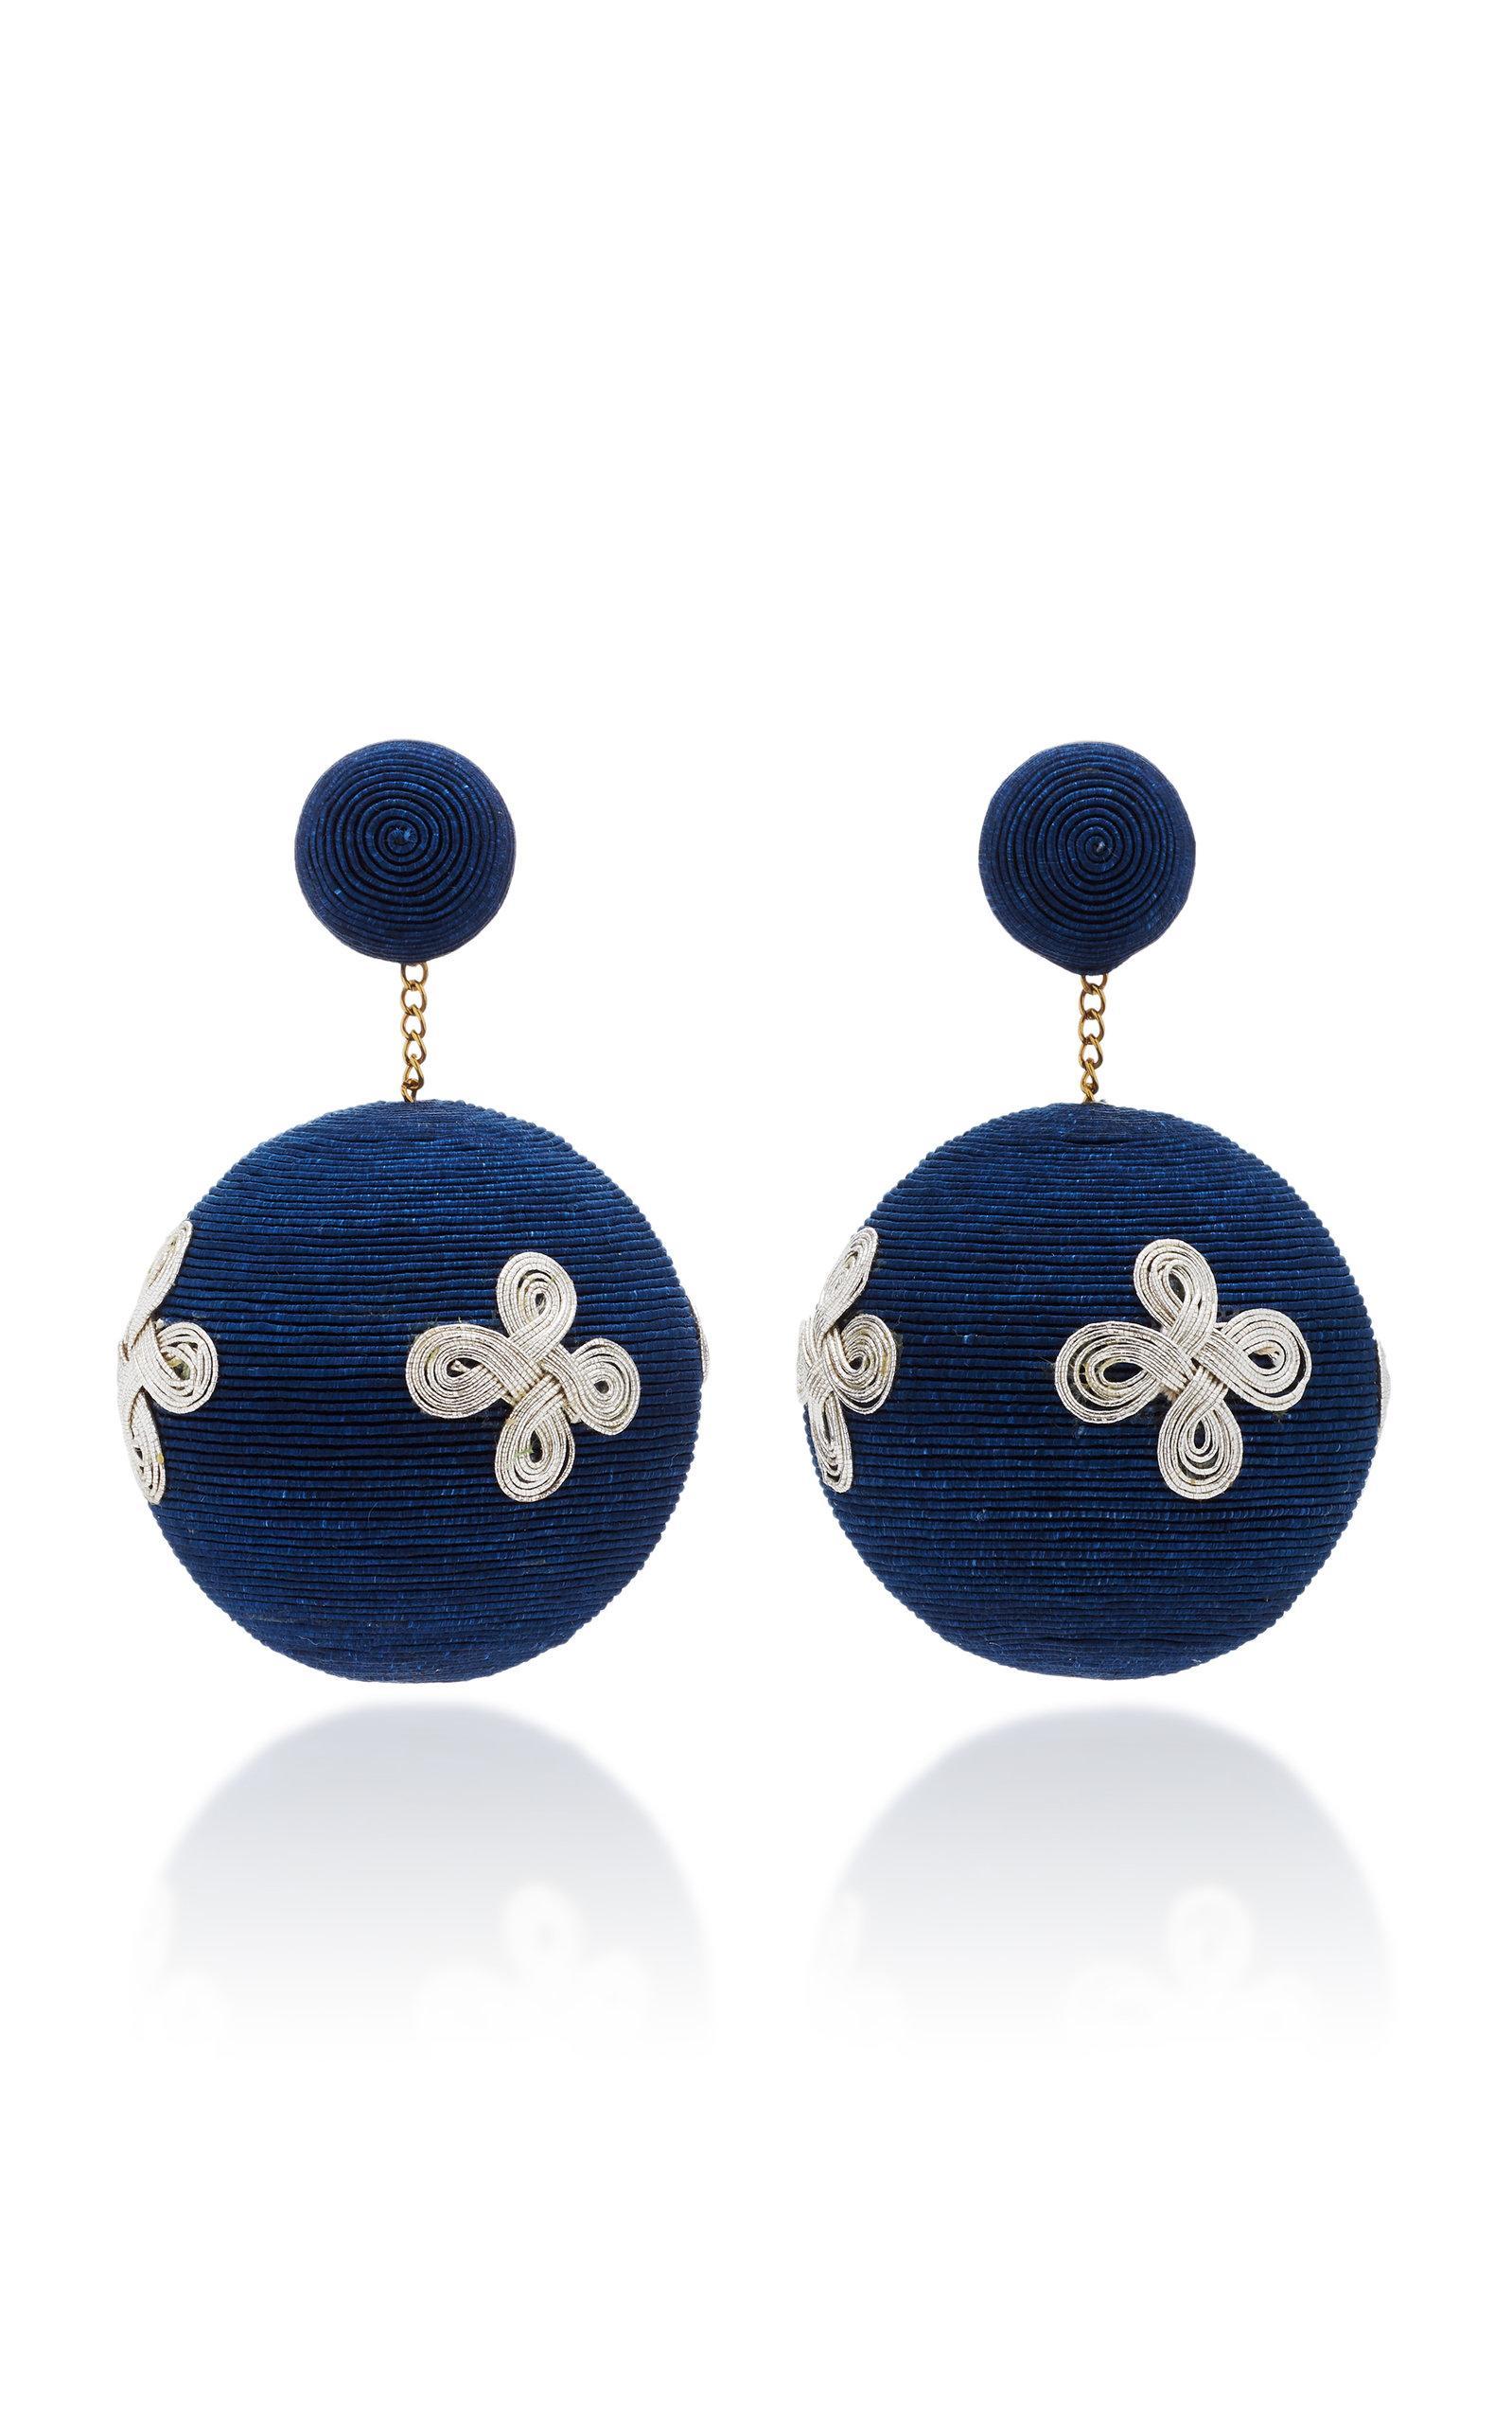 Rebecca De Ravenel Pandora Knot Navy Earrings